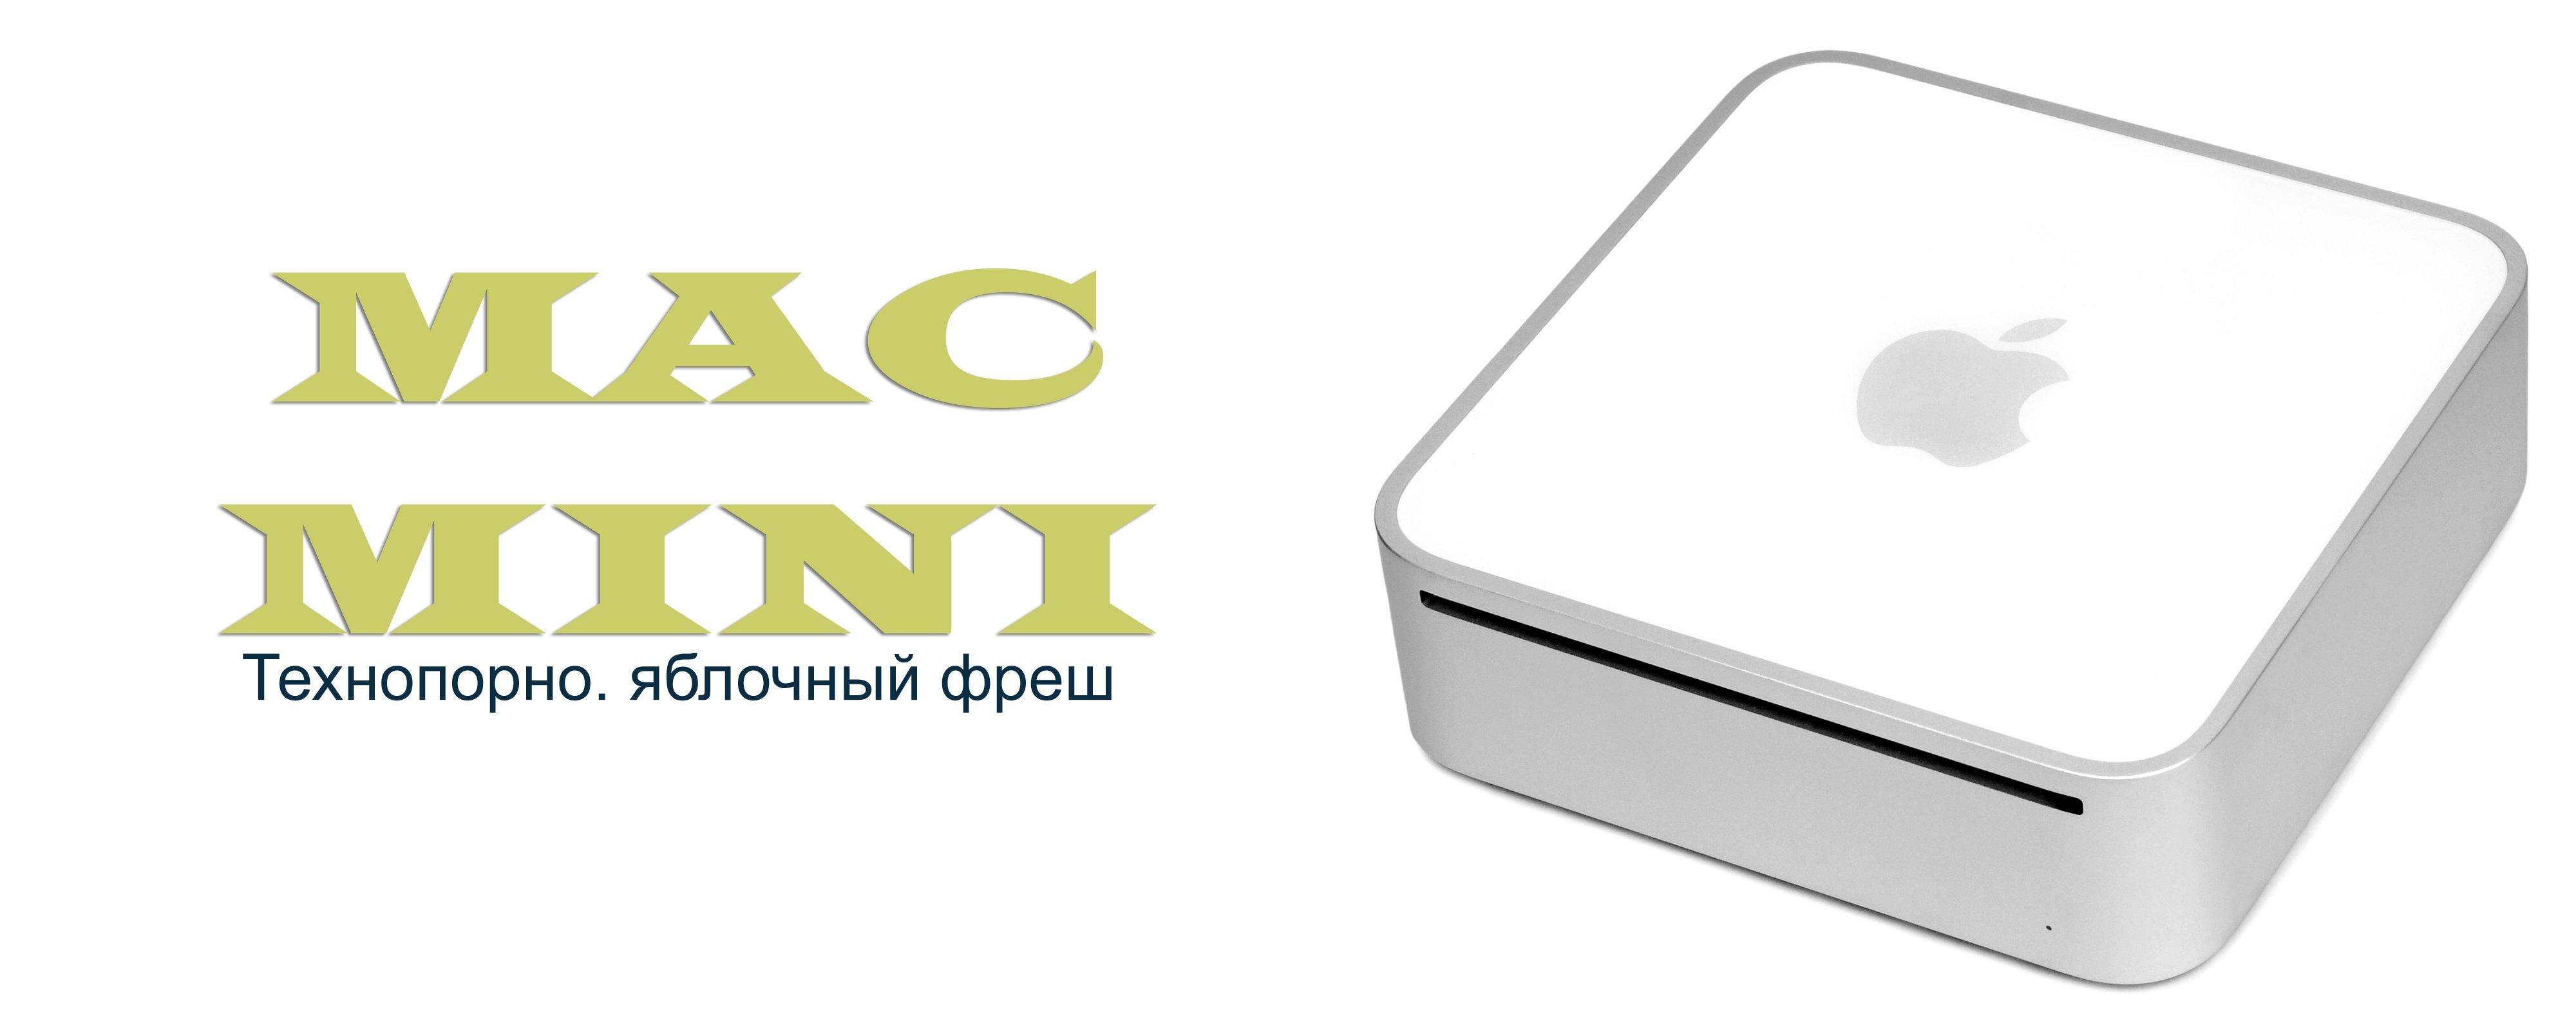 Mac mini дизайн